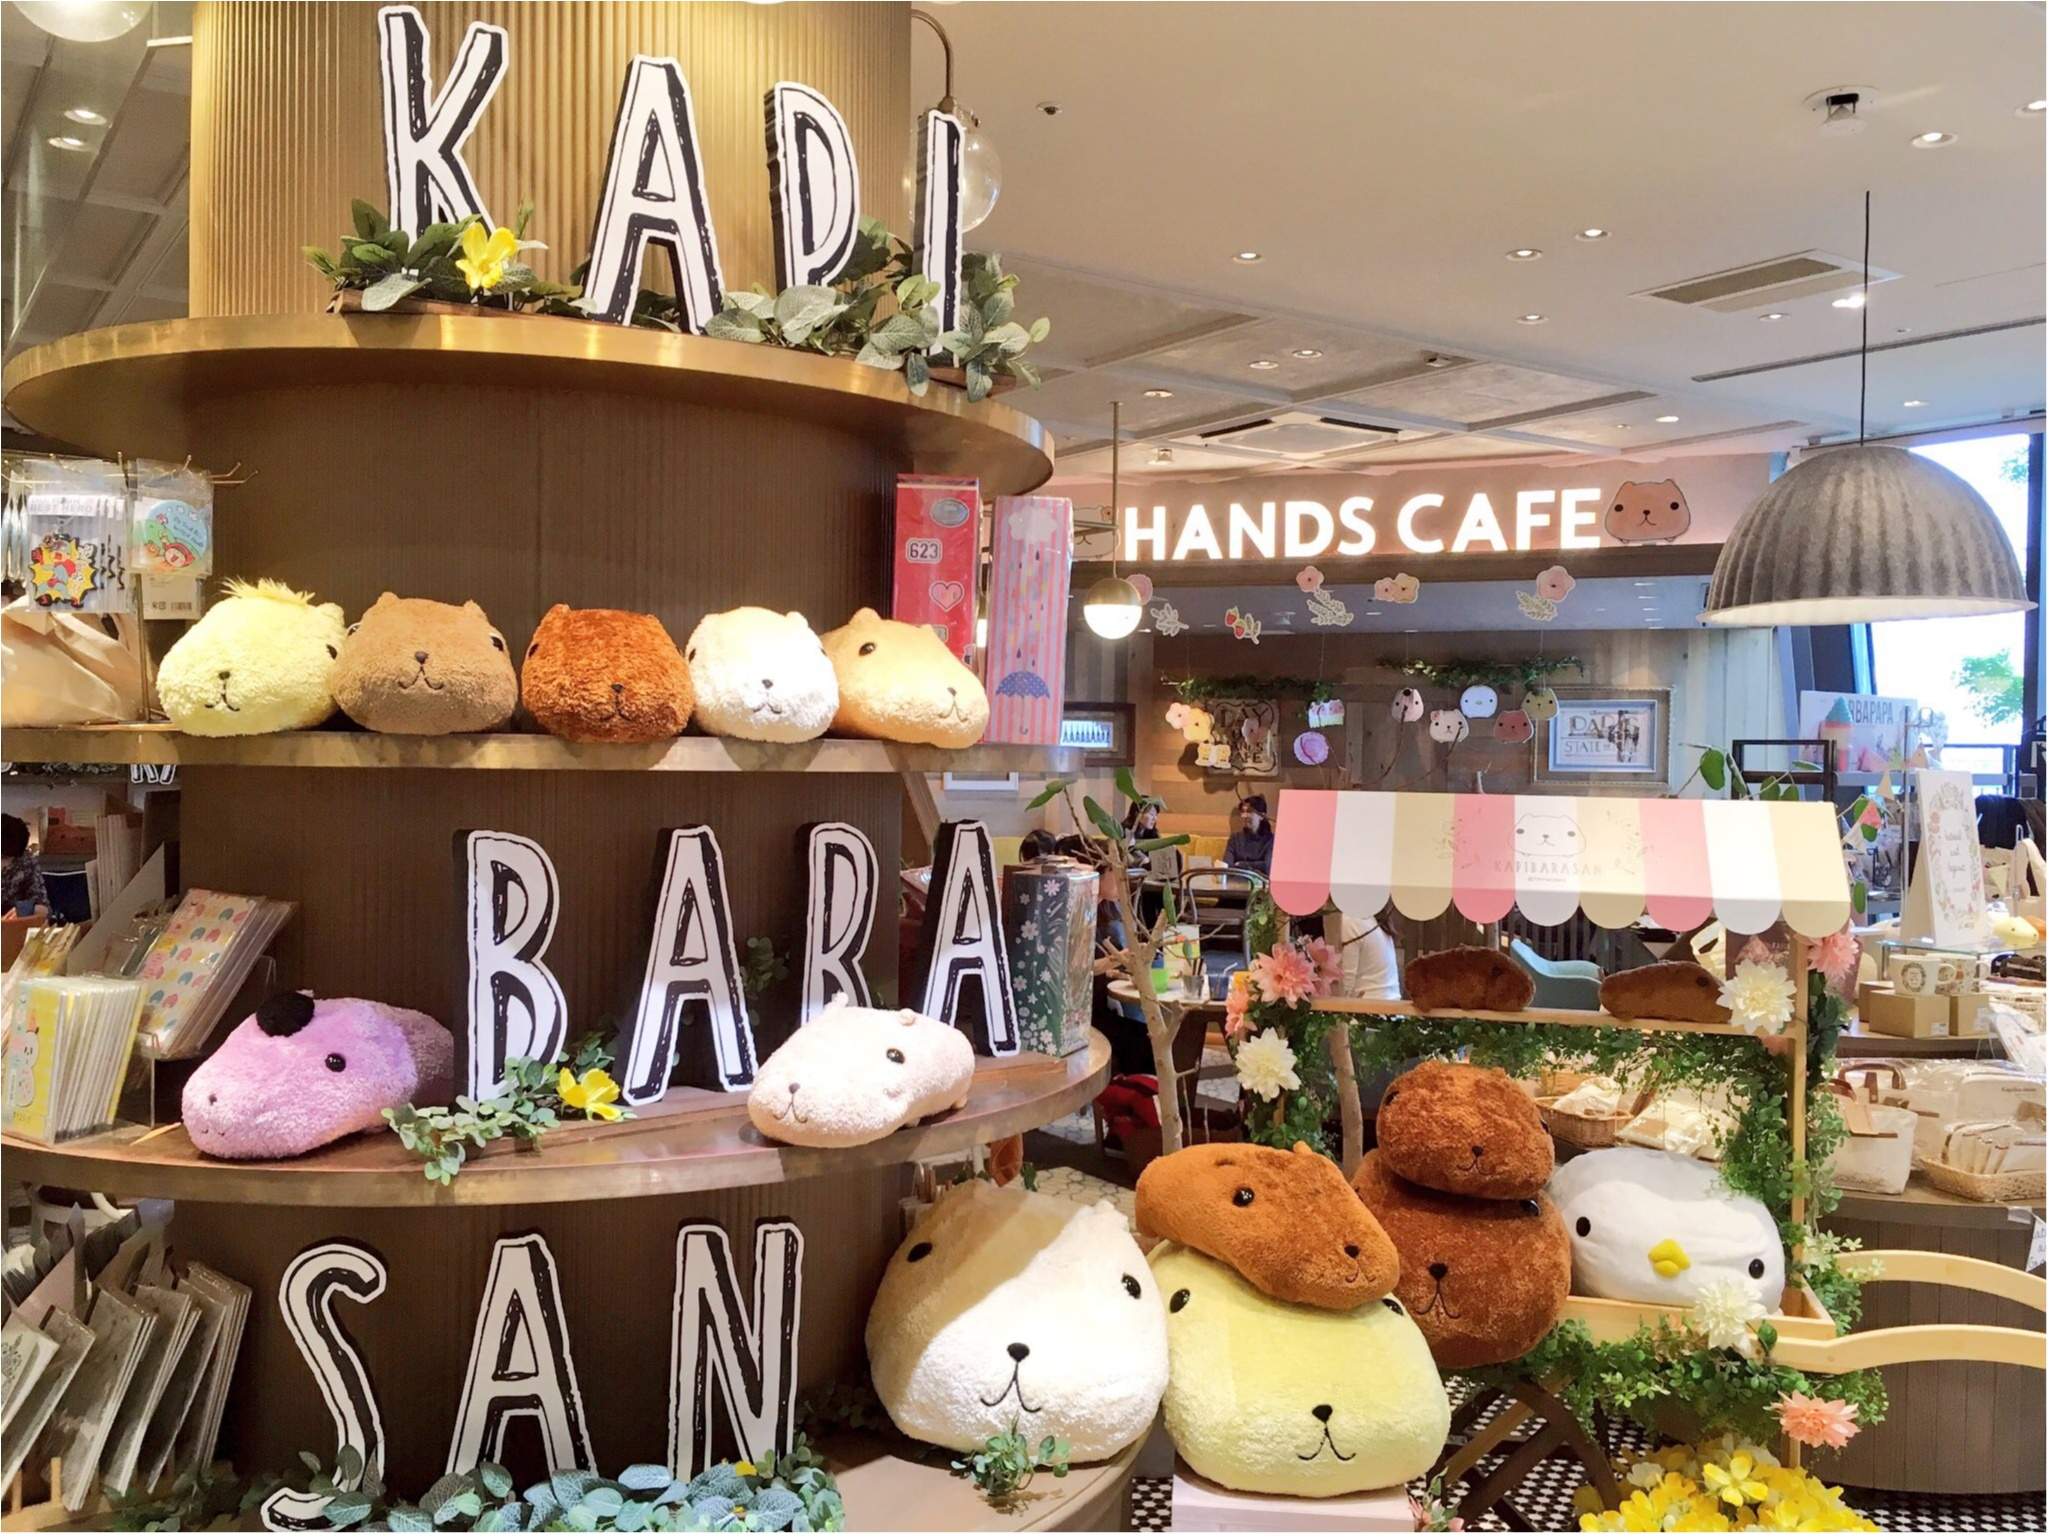 『KAPIBARASAN×HANDS CAFE』@東急表参道原宿店♡りぃイチオシメニューのご紹介(∗•ω•∗)♡_1